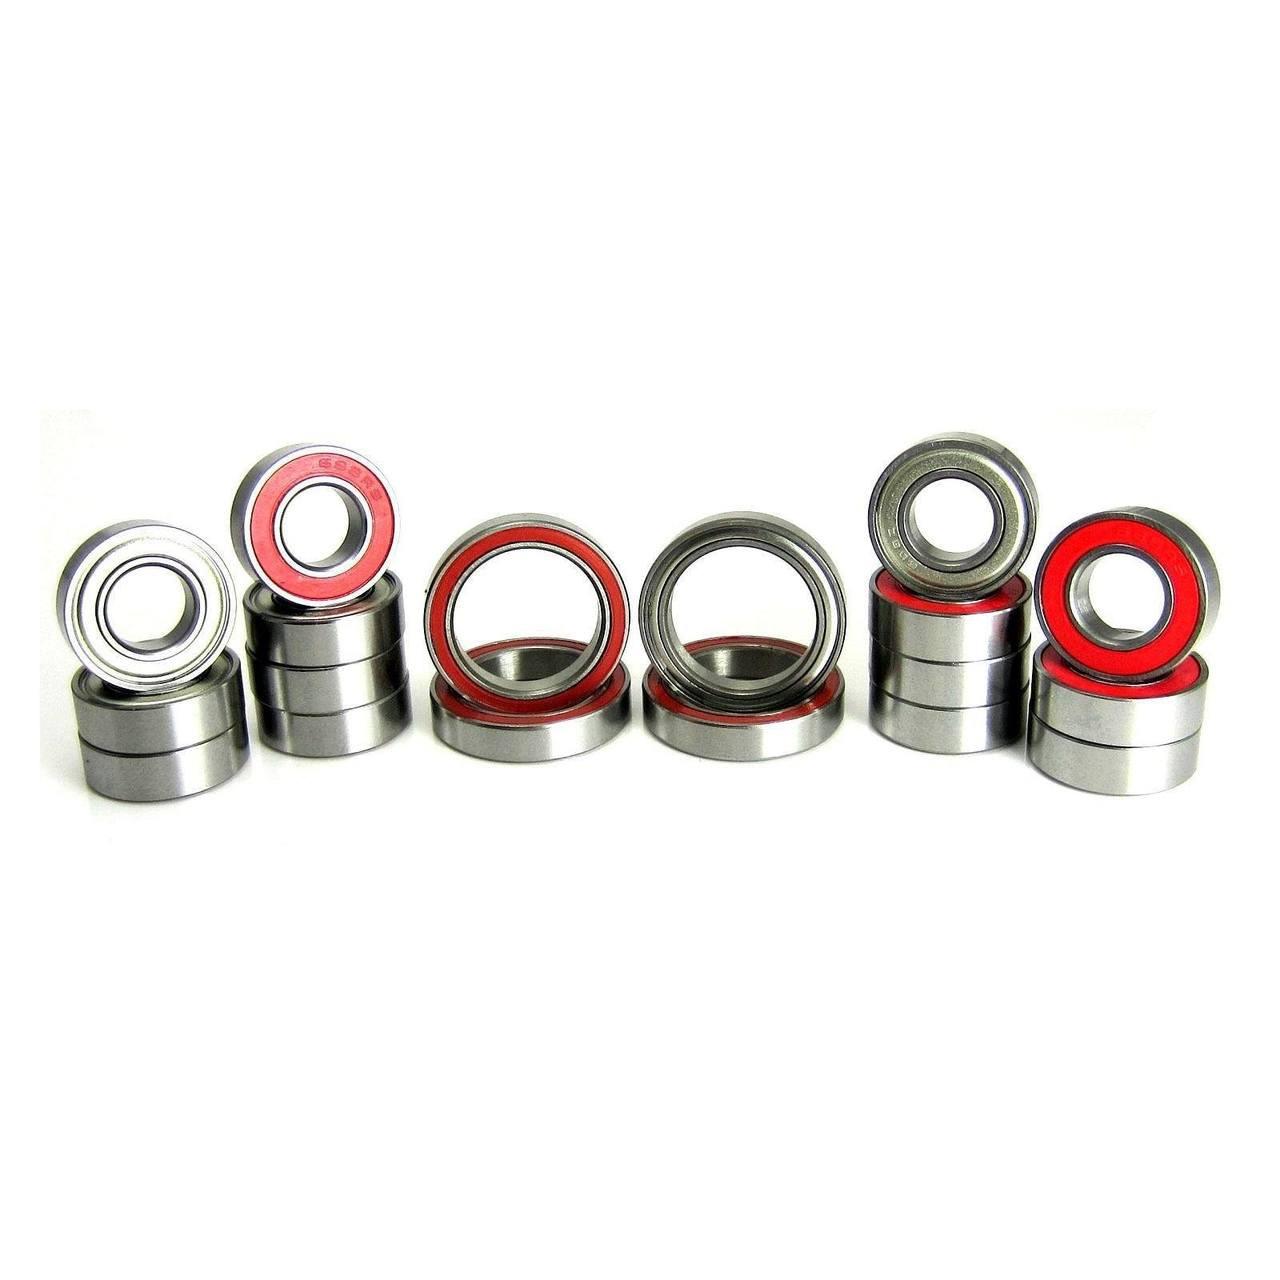 TRB RC Precision Ball Bearing Kit (18) Hybrid Seals Red SaberTooth 1/8 Truggy